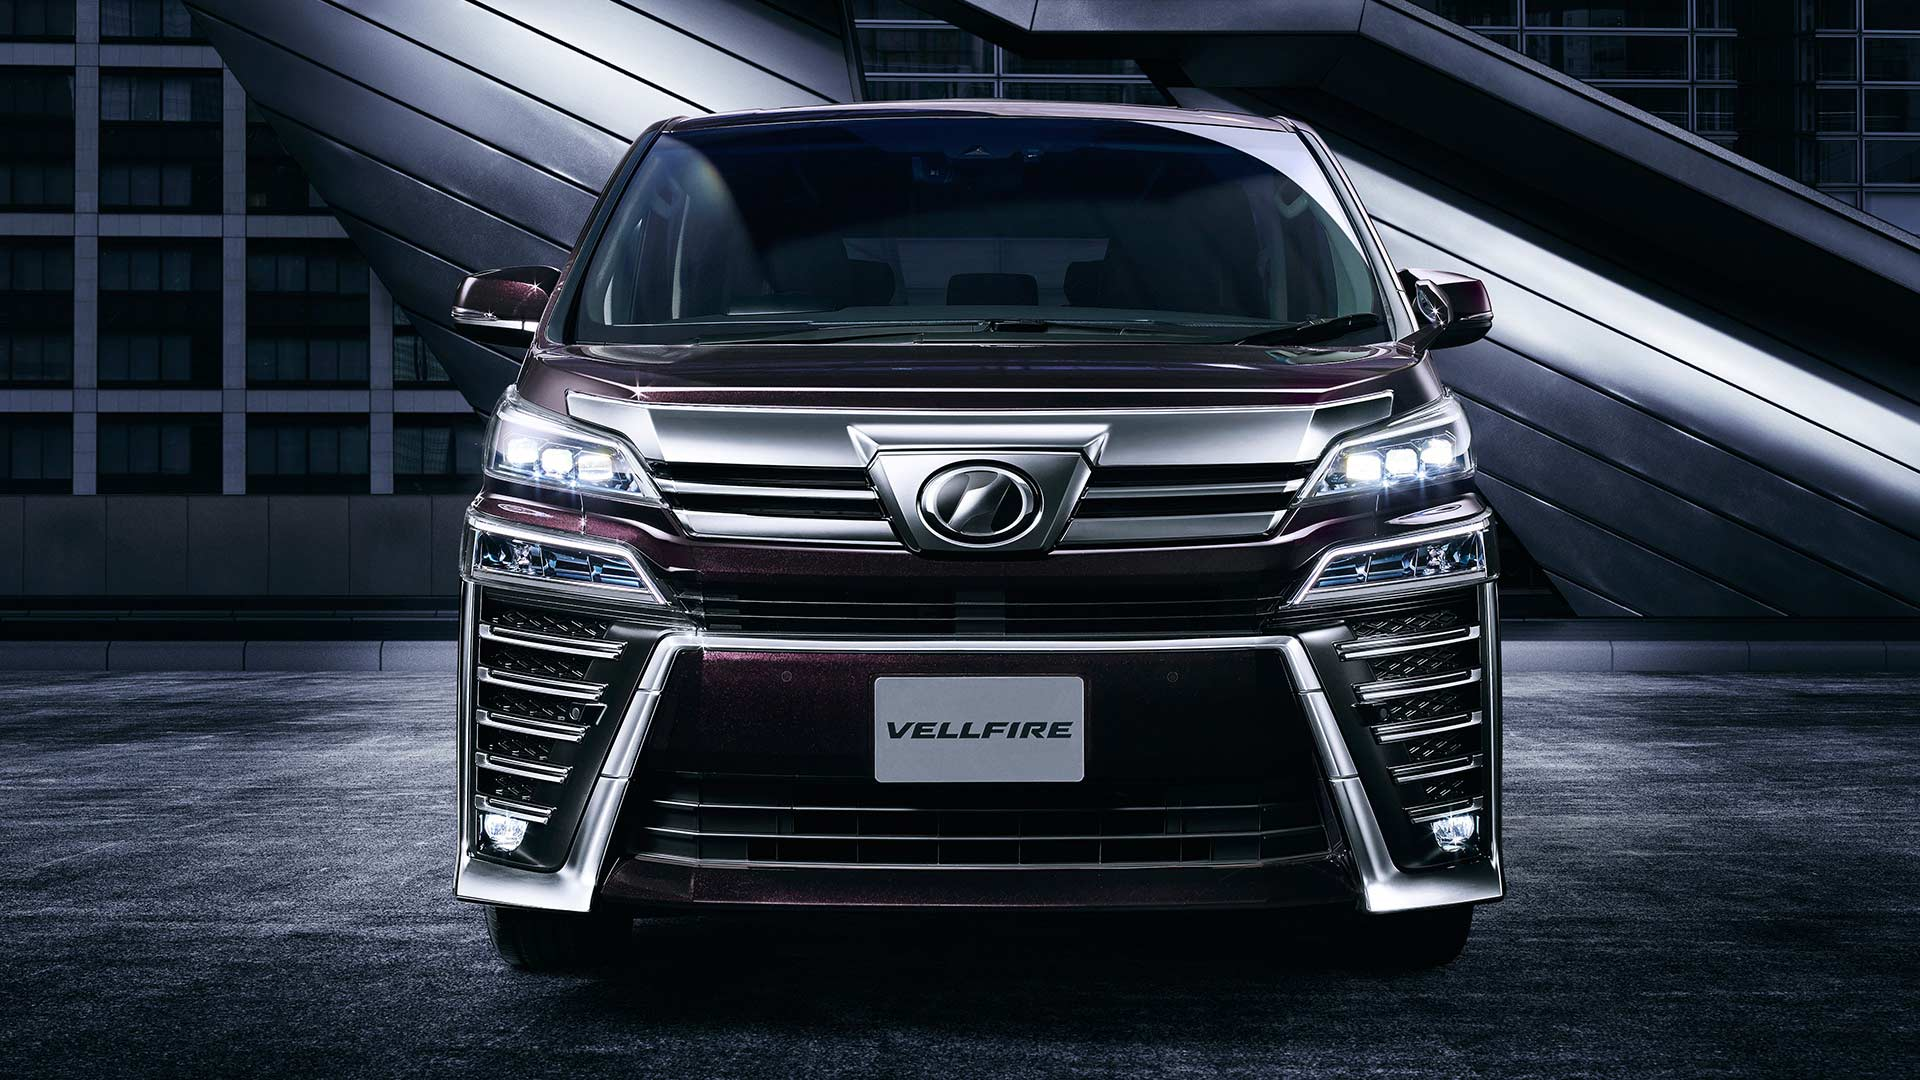 all new alphard 2.5 x toyota camry 2018 thailand and vellfire revealed autodevot